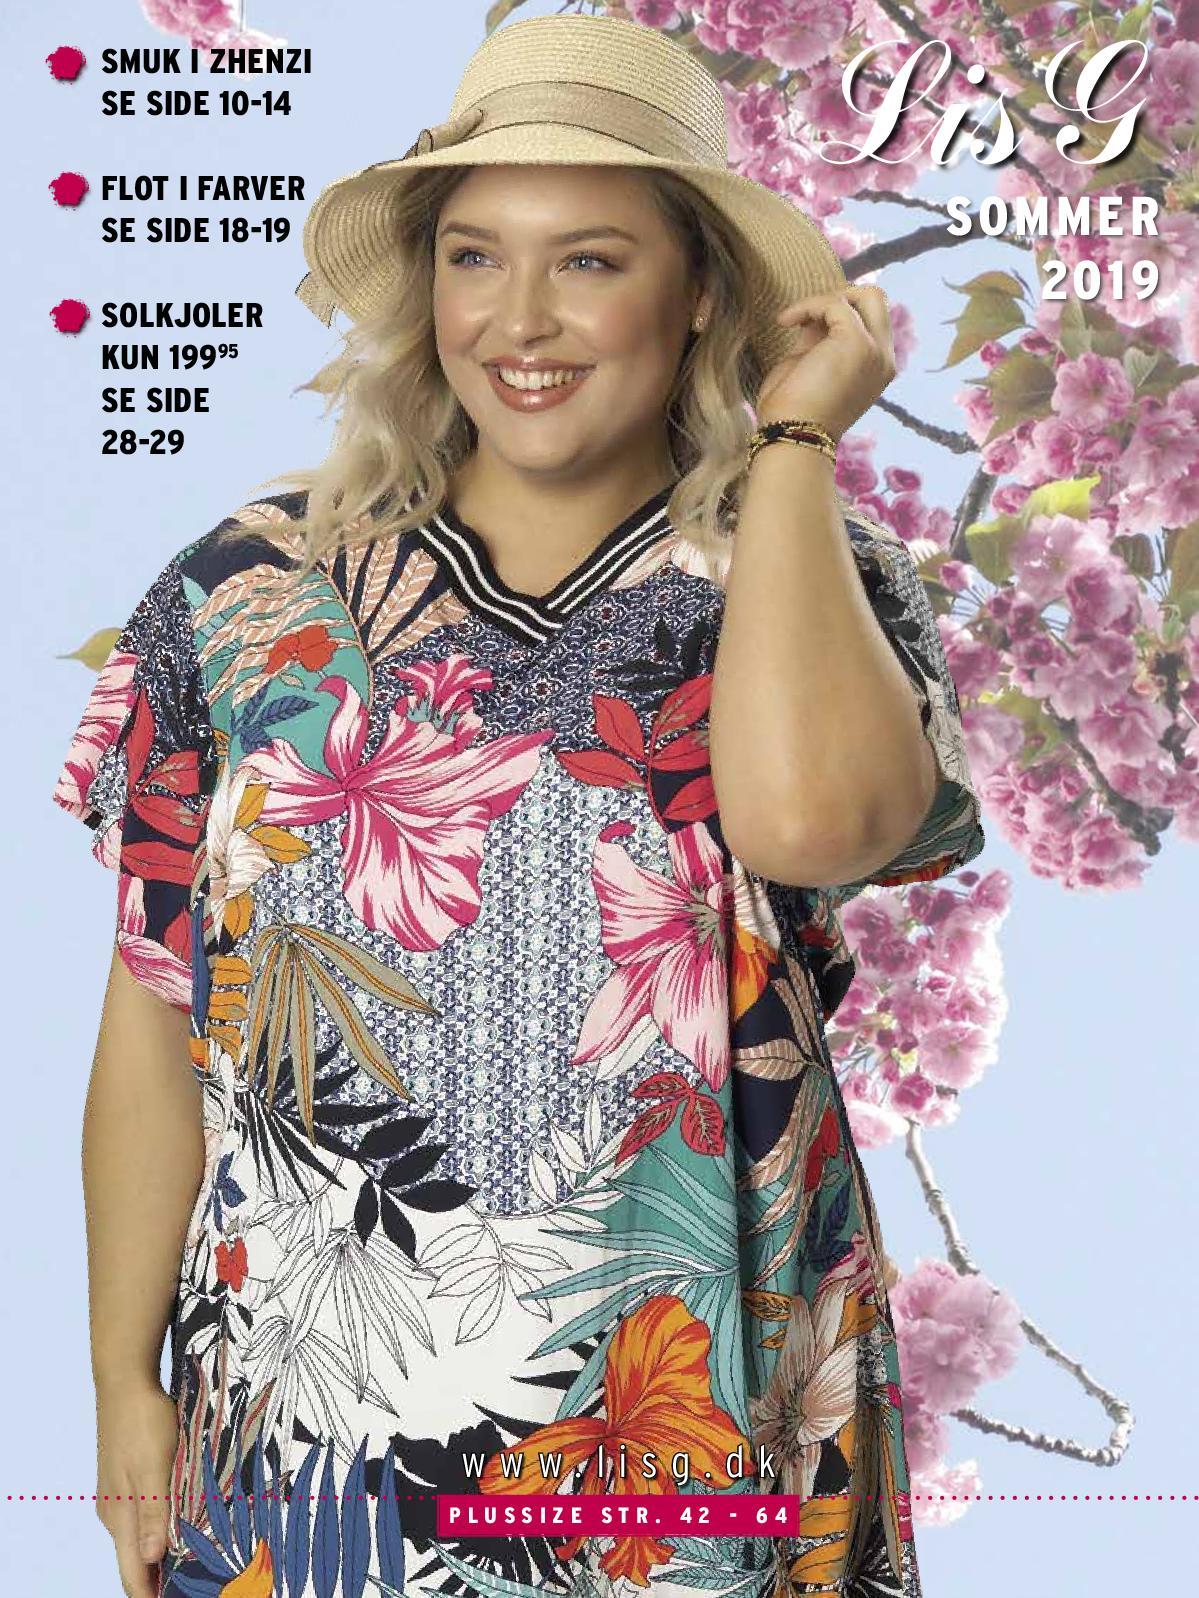 d3ff419b Calaméo - Lis G Plus Size Summer 2019 (1)